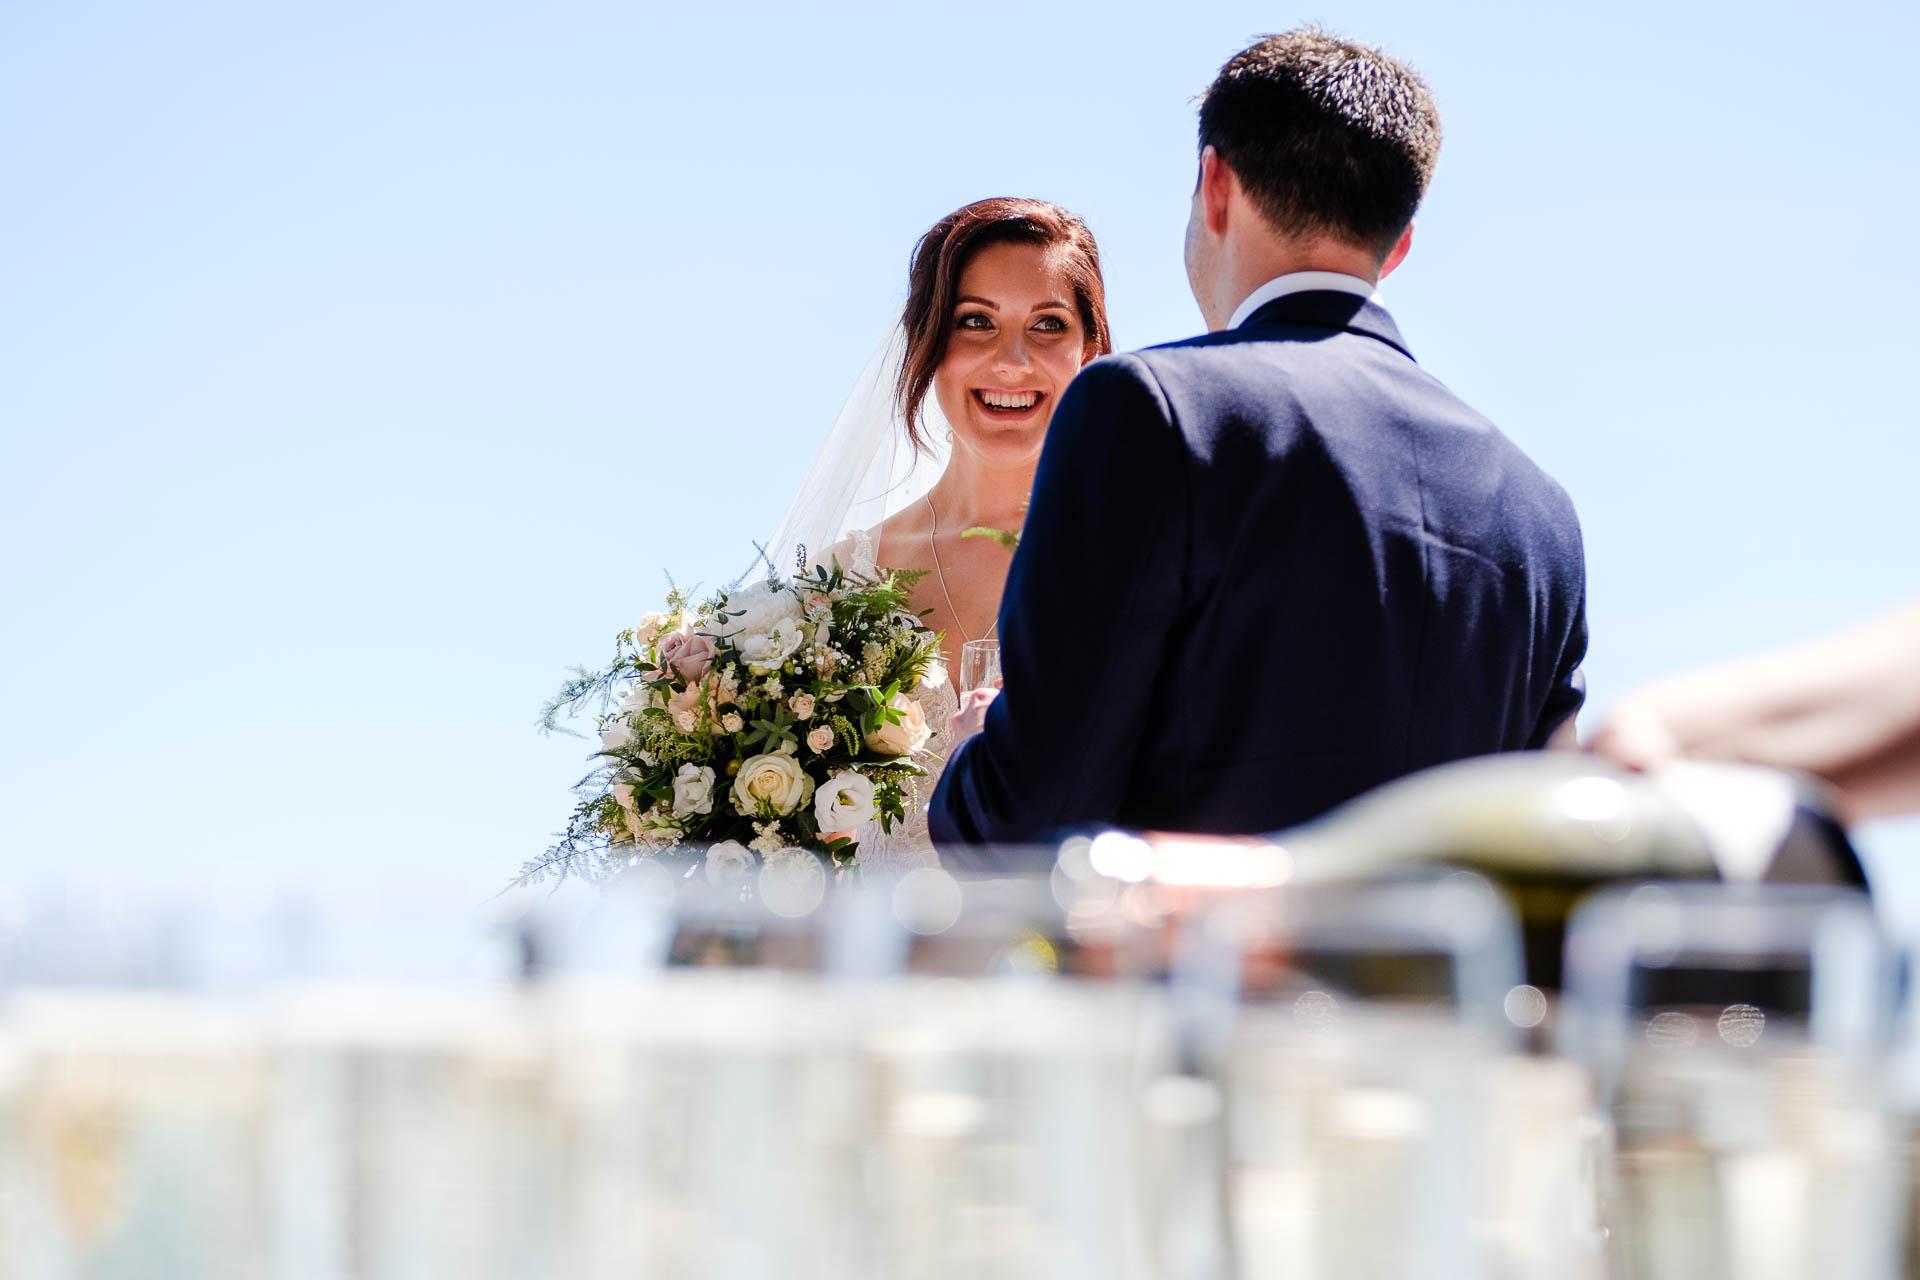 orchardleigh house wedding - Danni & Barney (222).jpg